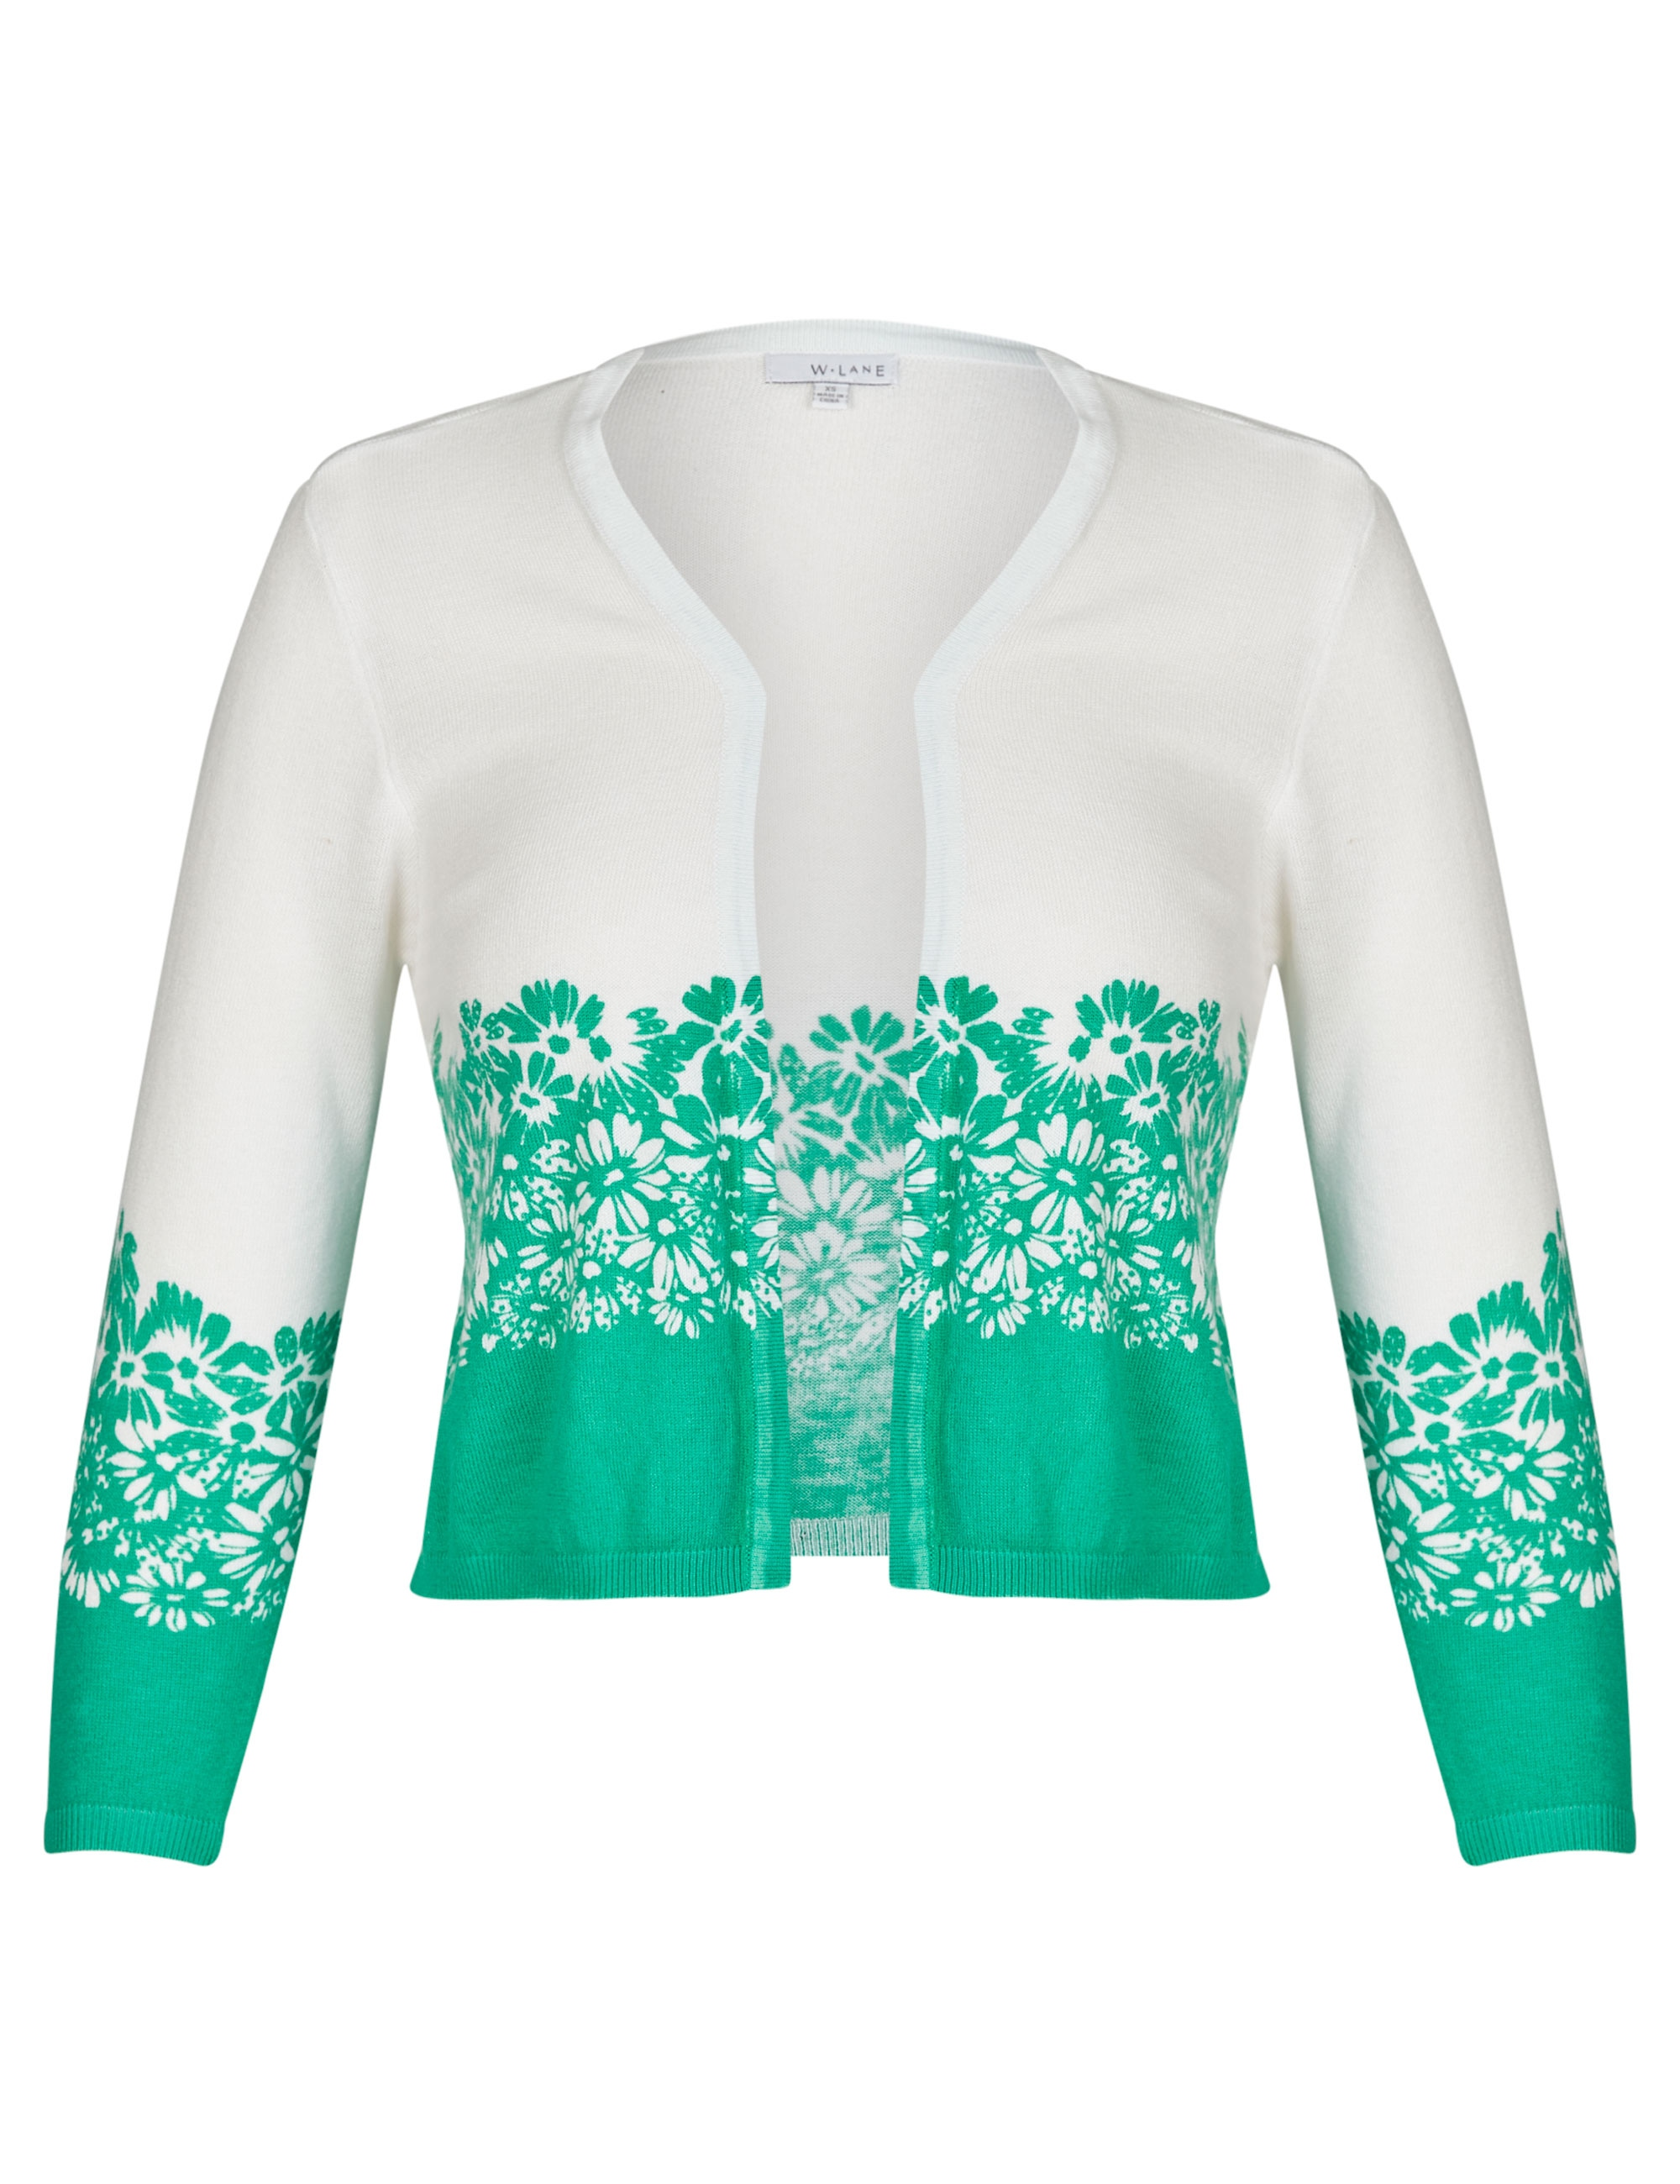 1055324310 2 - Women Fashion